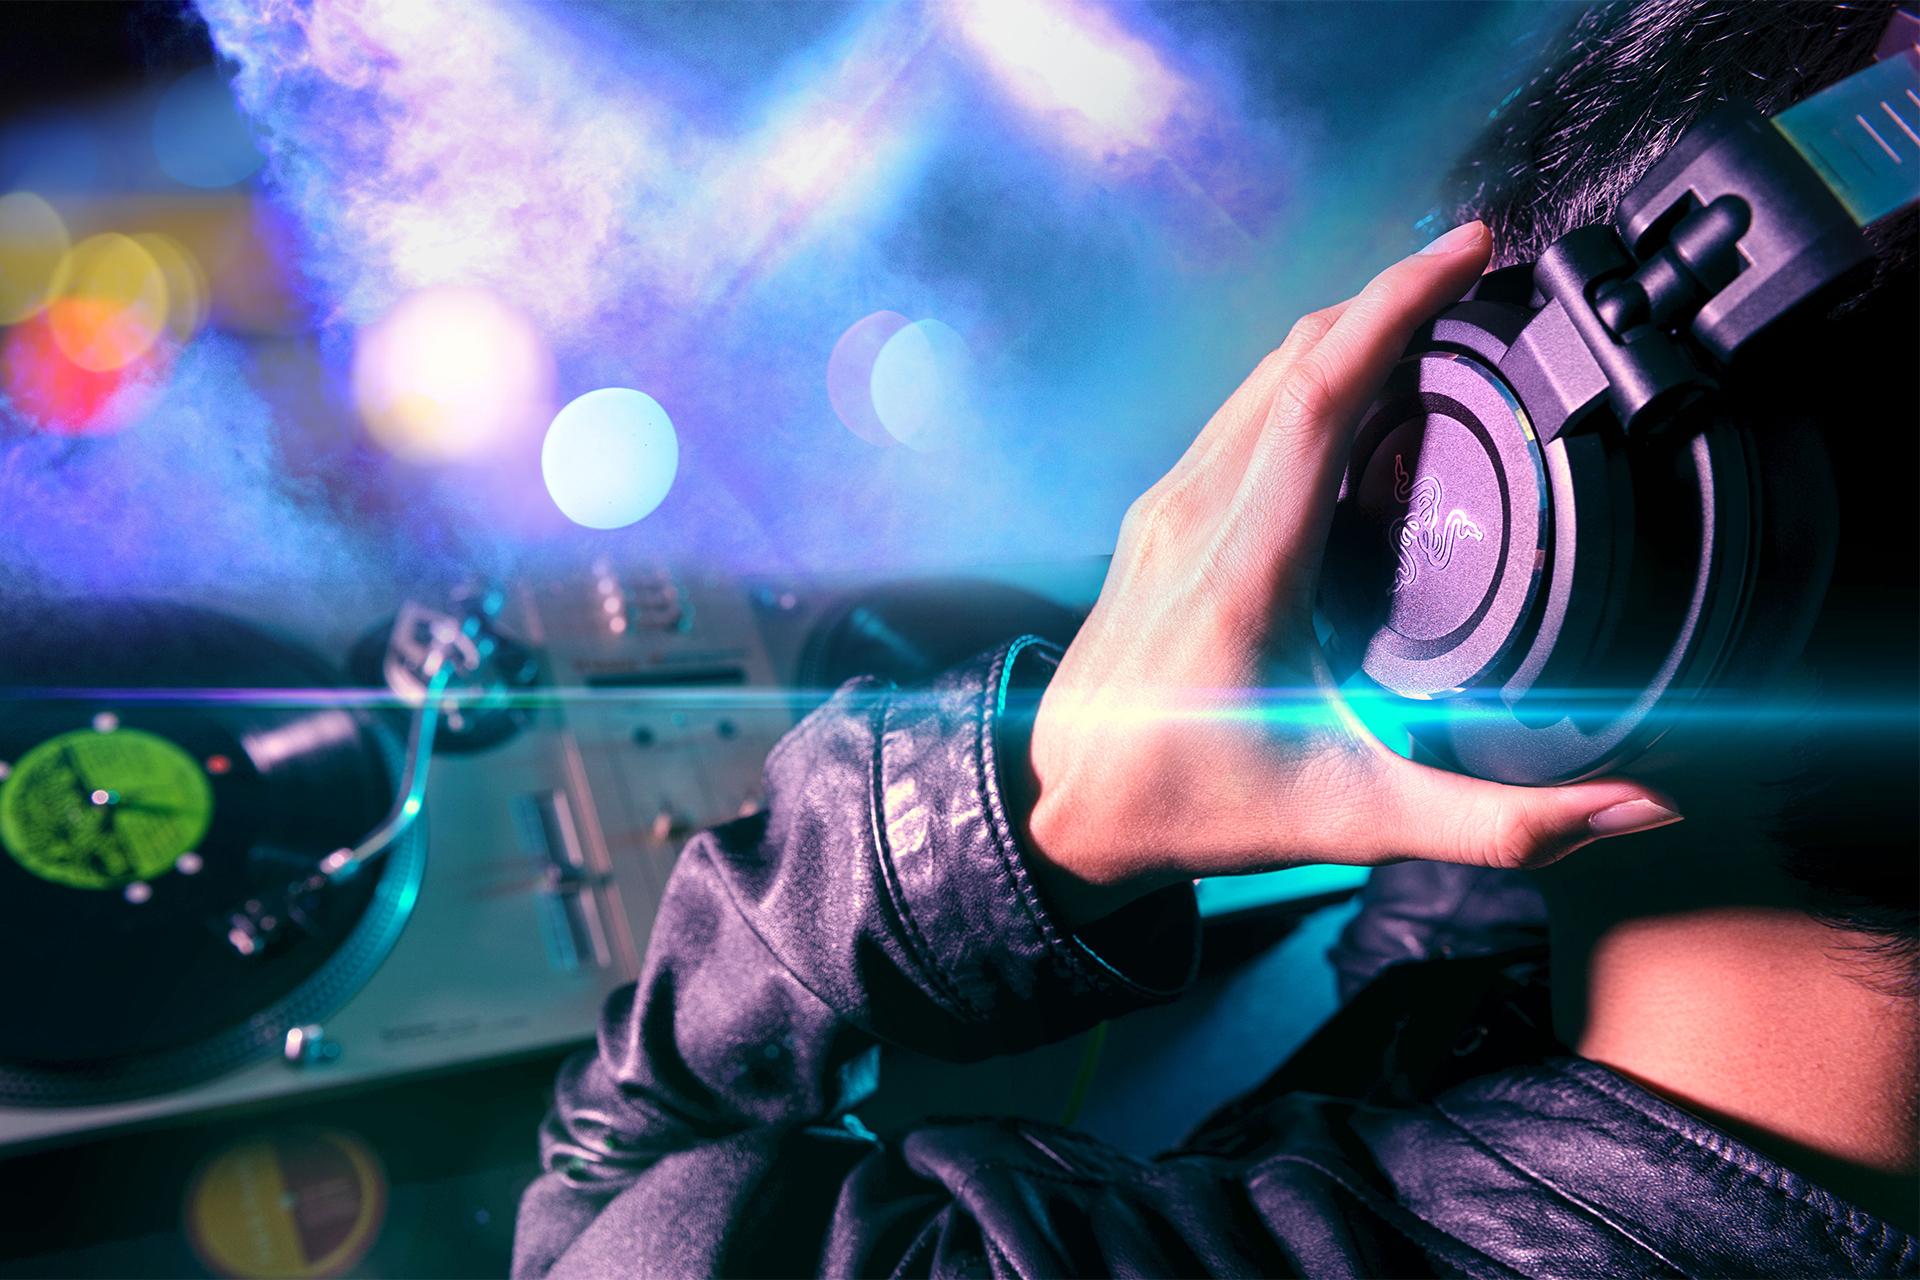 Wallpaper Djs Girl Razer Adaro Dj Analog Dj Headphones Razer Australia